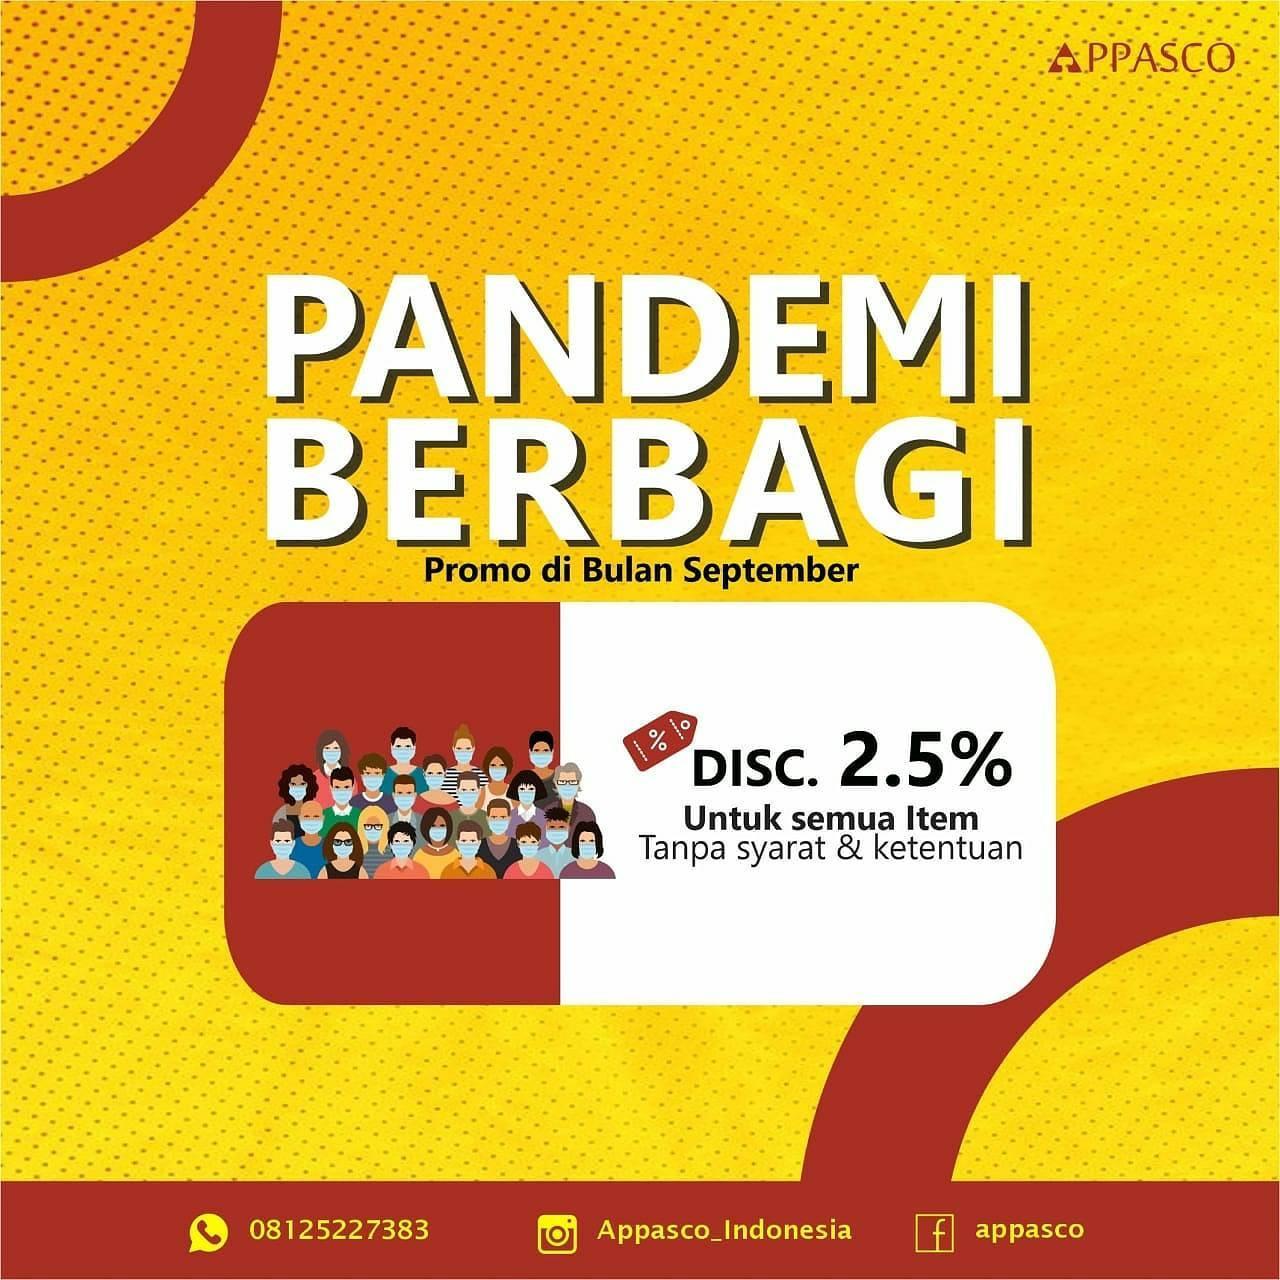 Promo Pandemi Appasco